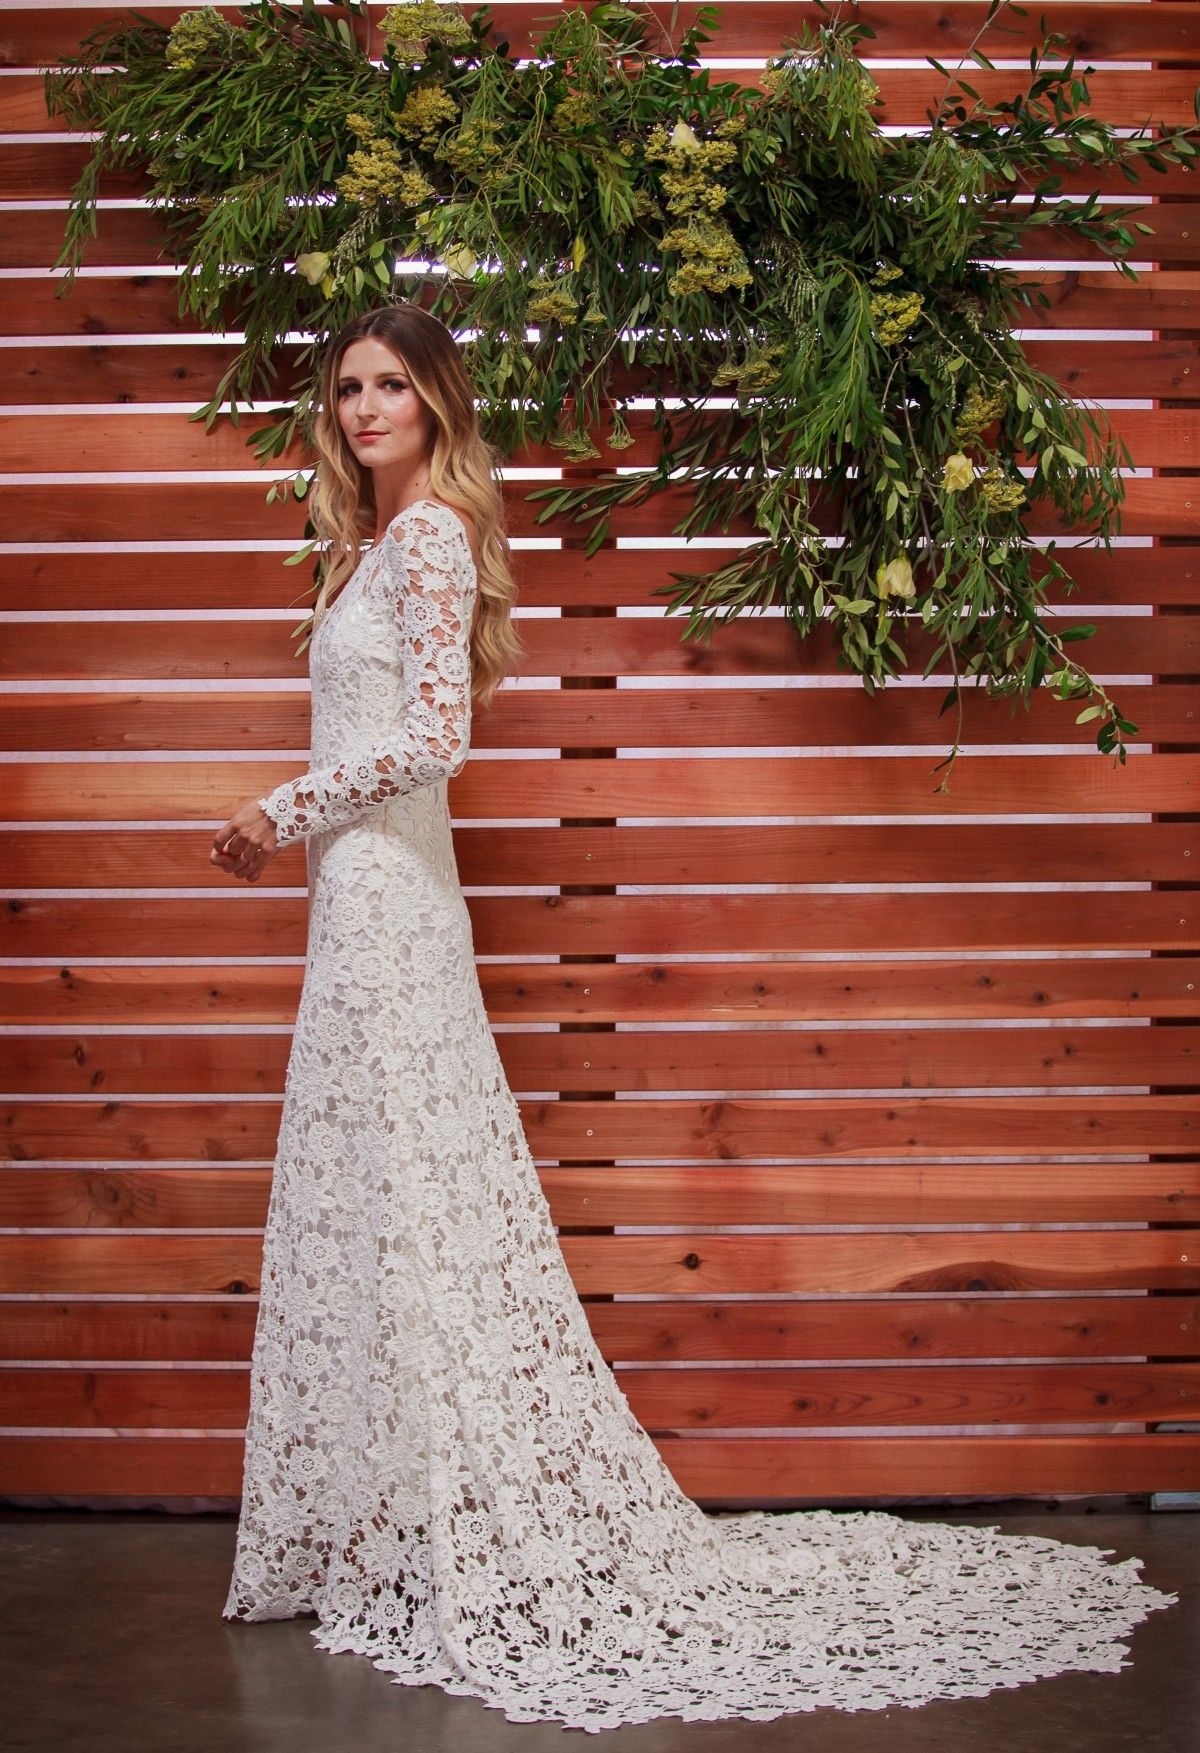 Crochet and Lace Wedding Dress